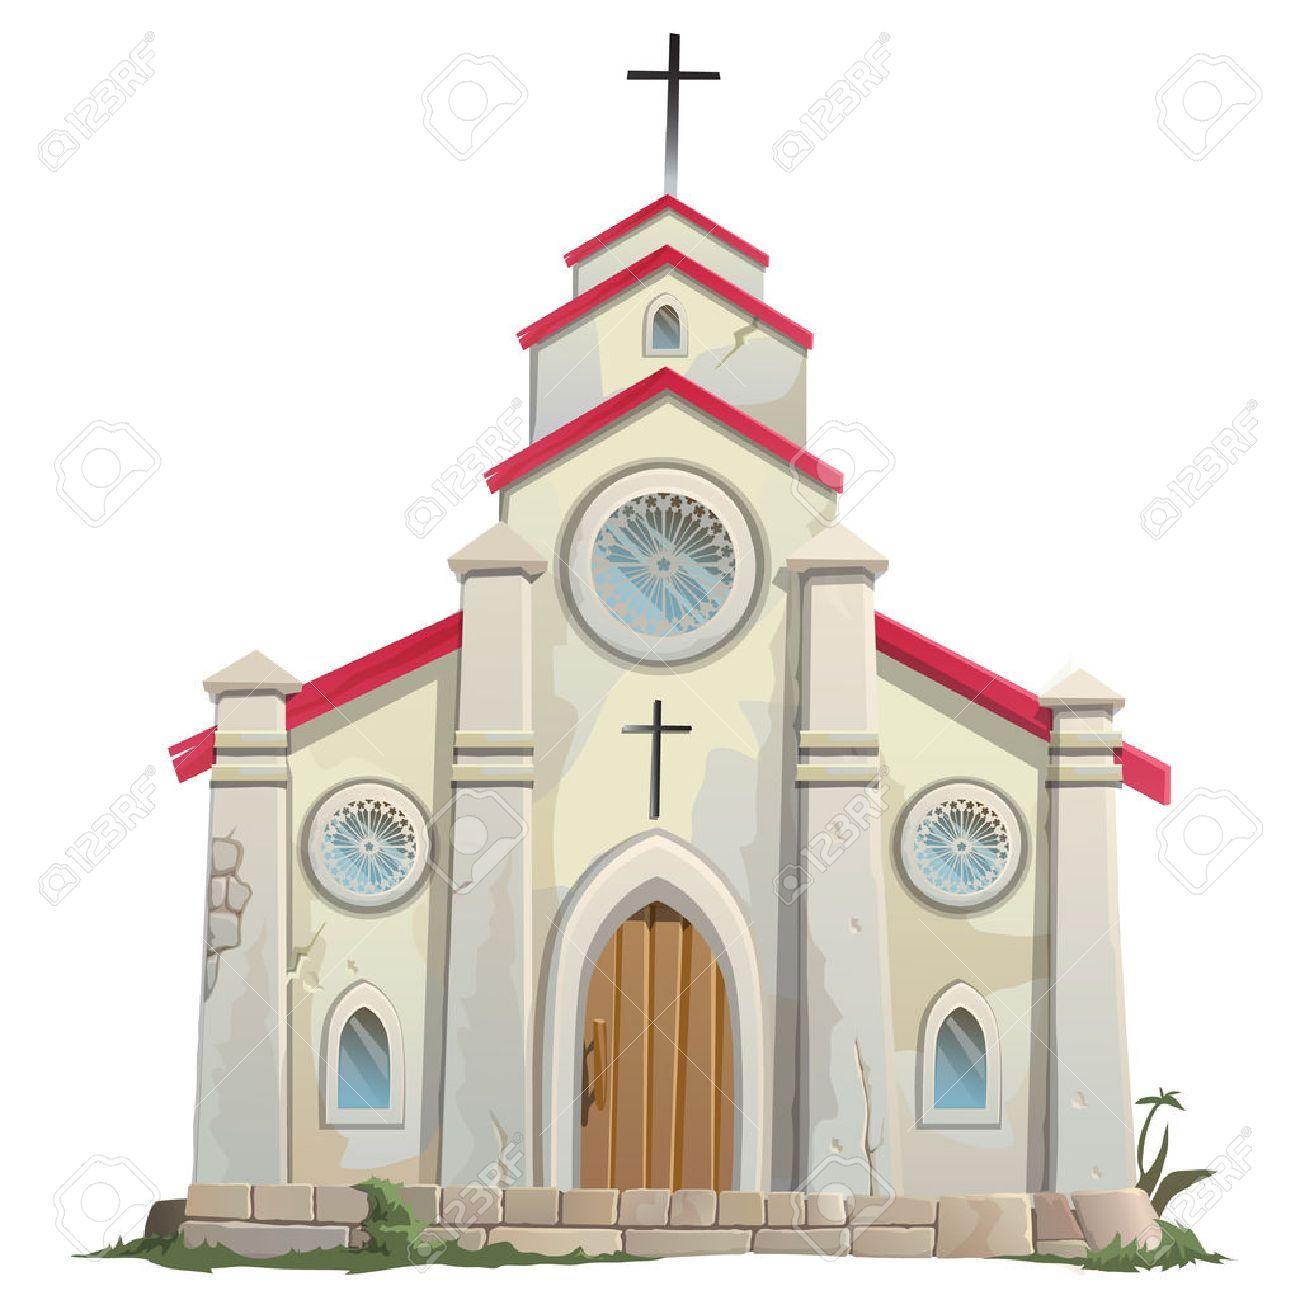 jpg freeuse download Pin by charlye on. Catholic clipart catholic church.